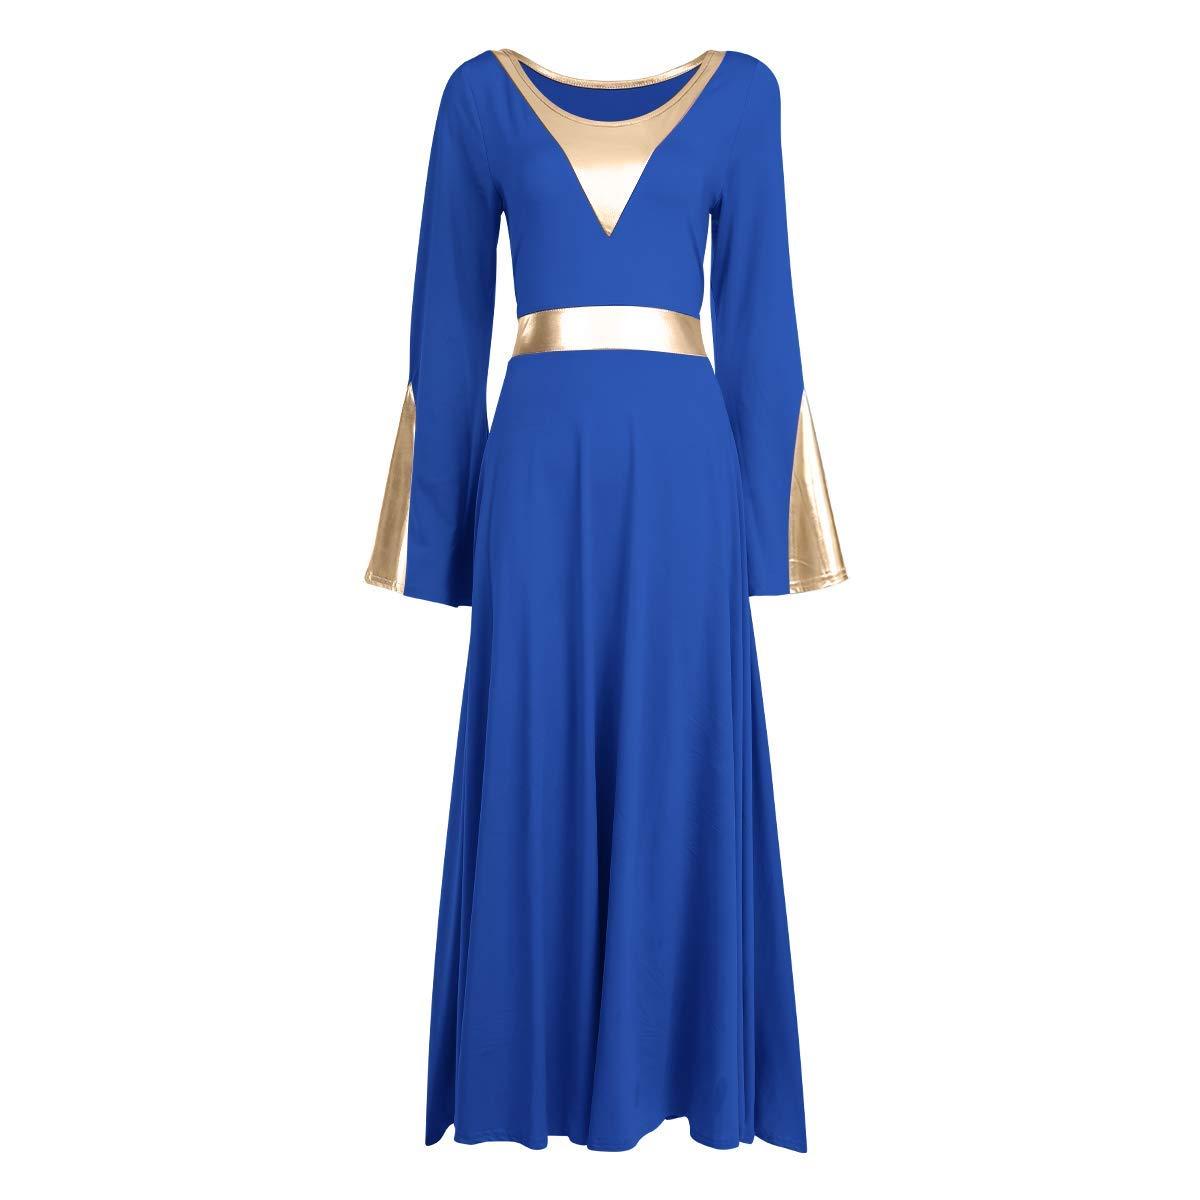 Women Metallic Color Block Liturgical Praise Lyrical Dance Dress Bell Long Sleeve Church Dancewear Gown Worship Costume